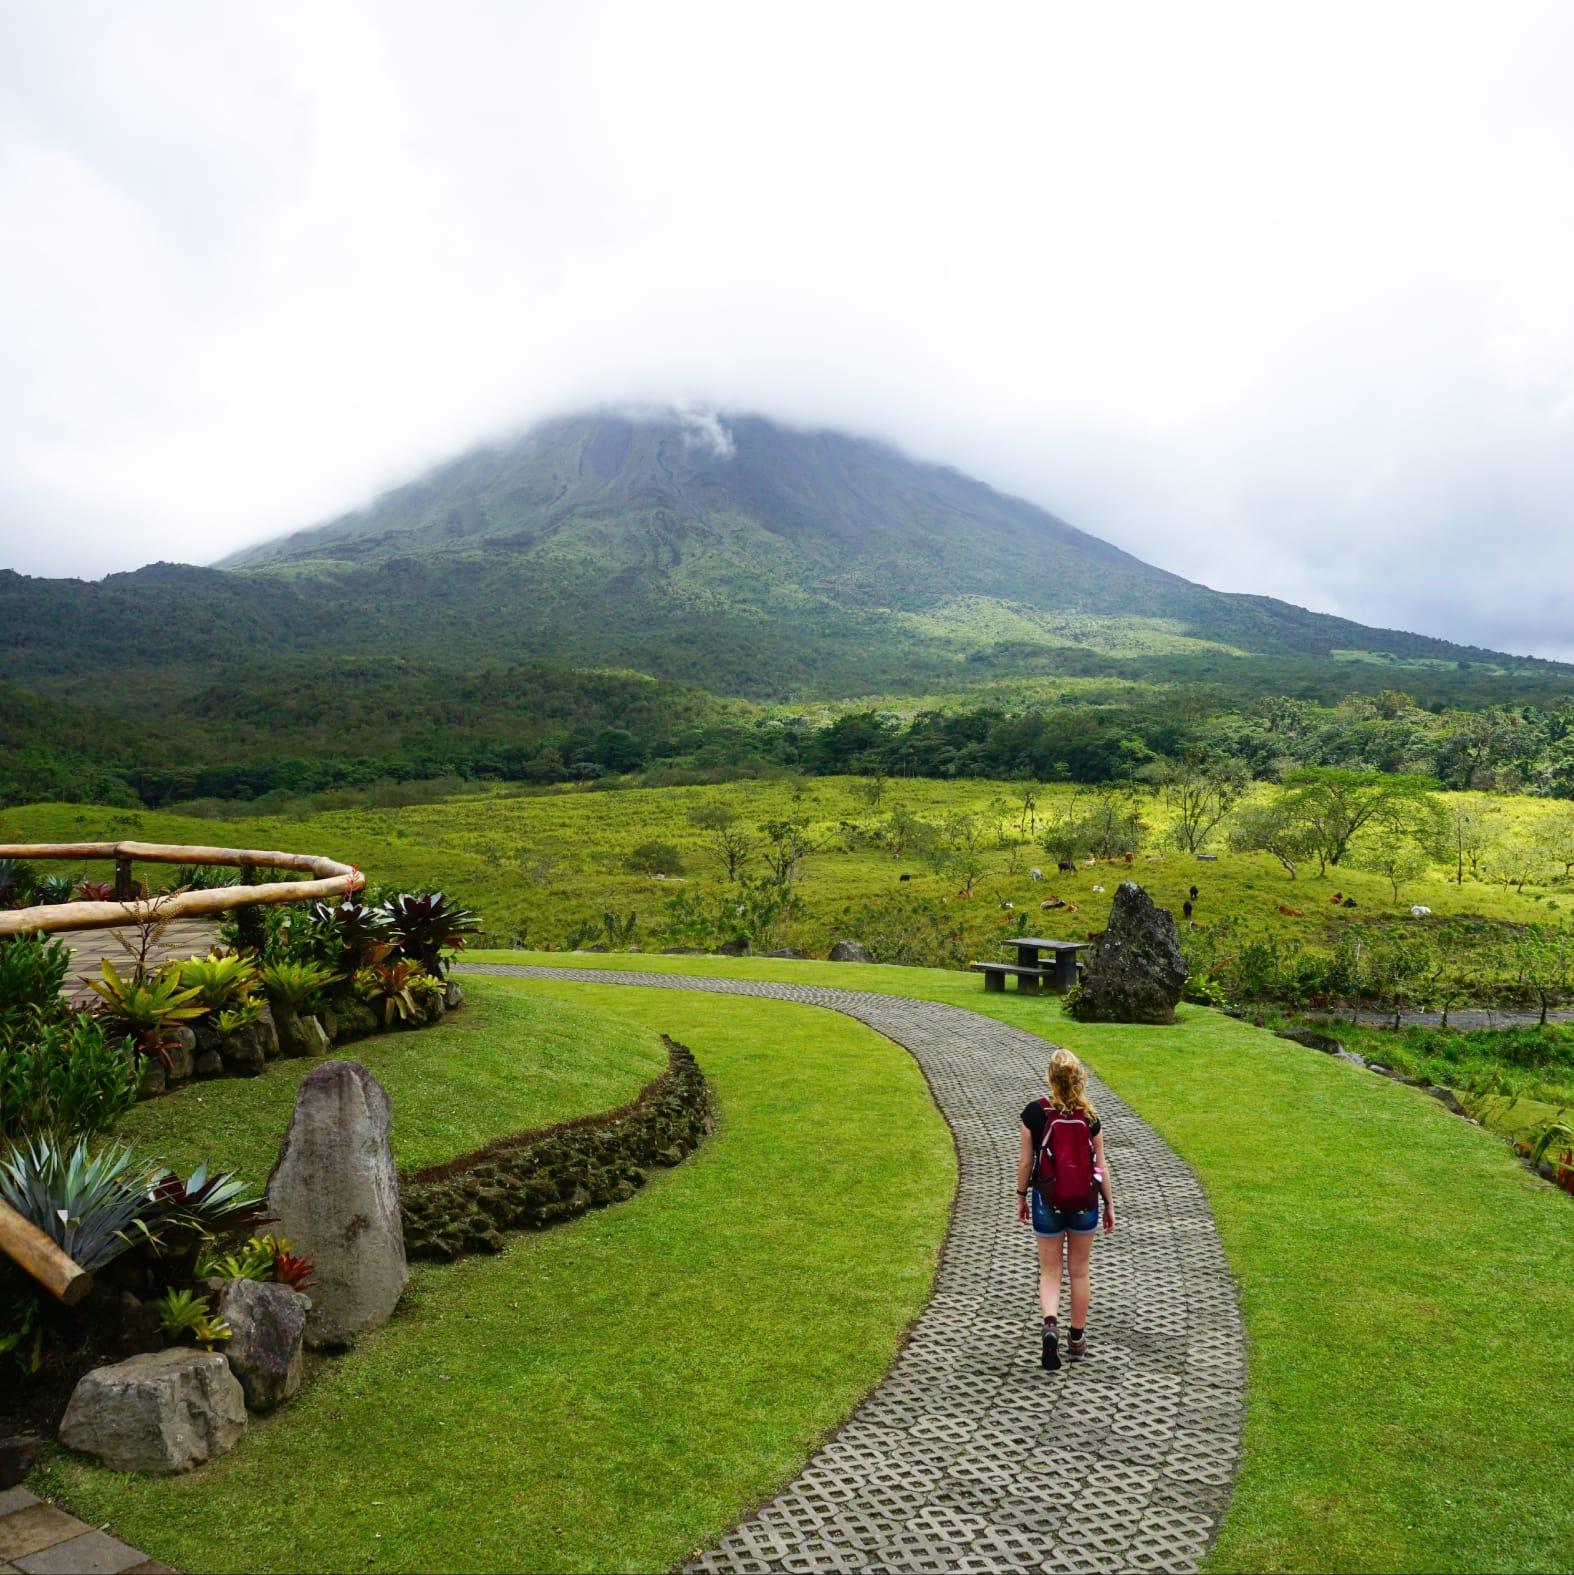 Wereldreis update maand #5: Nicaragua, Costa Rica en Panama